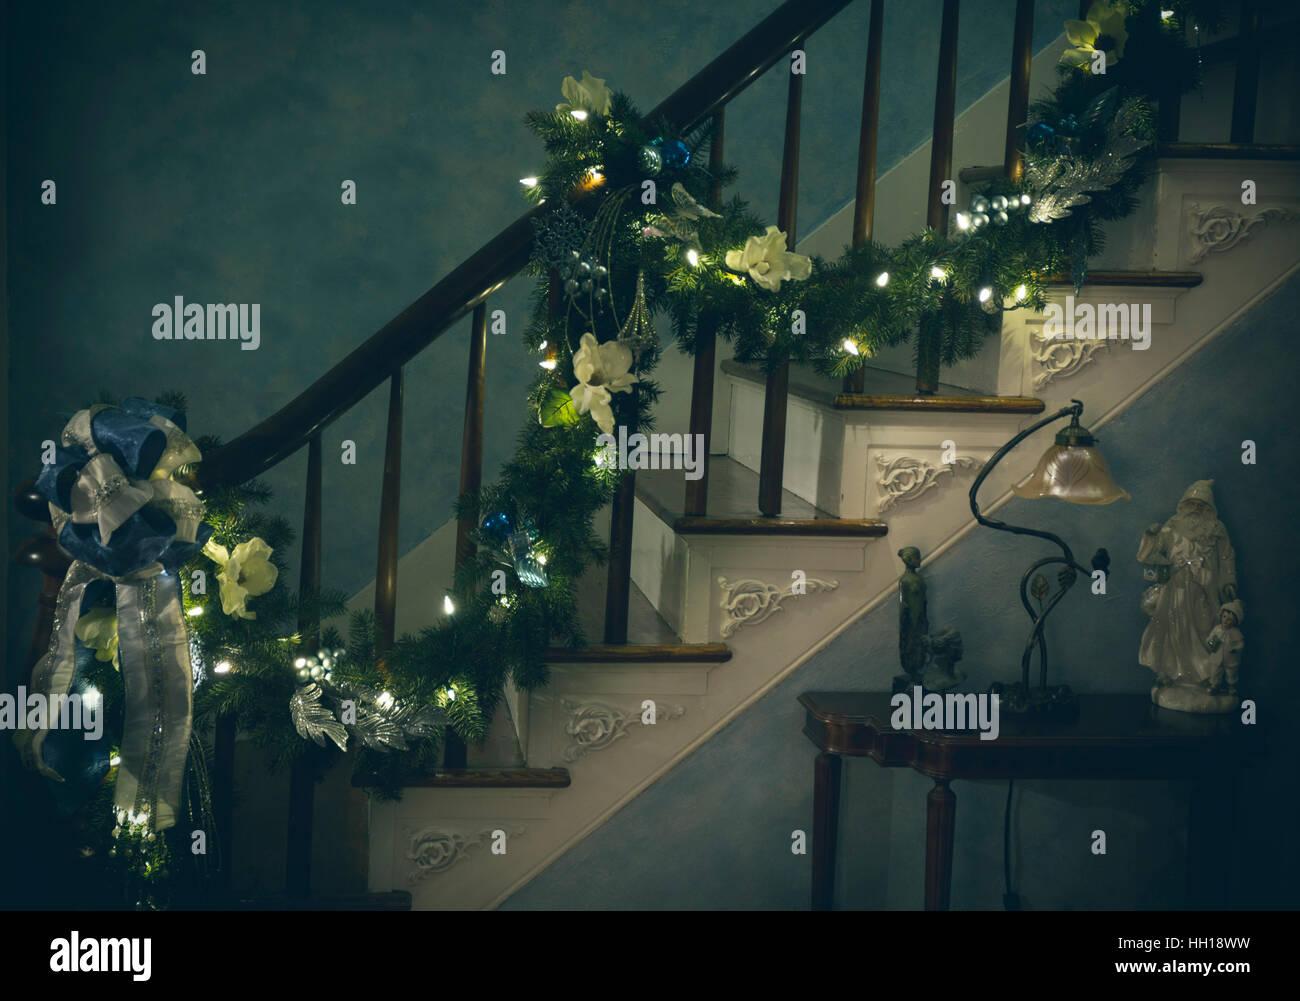 Christmas garland going up staircase - Stock Image